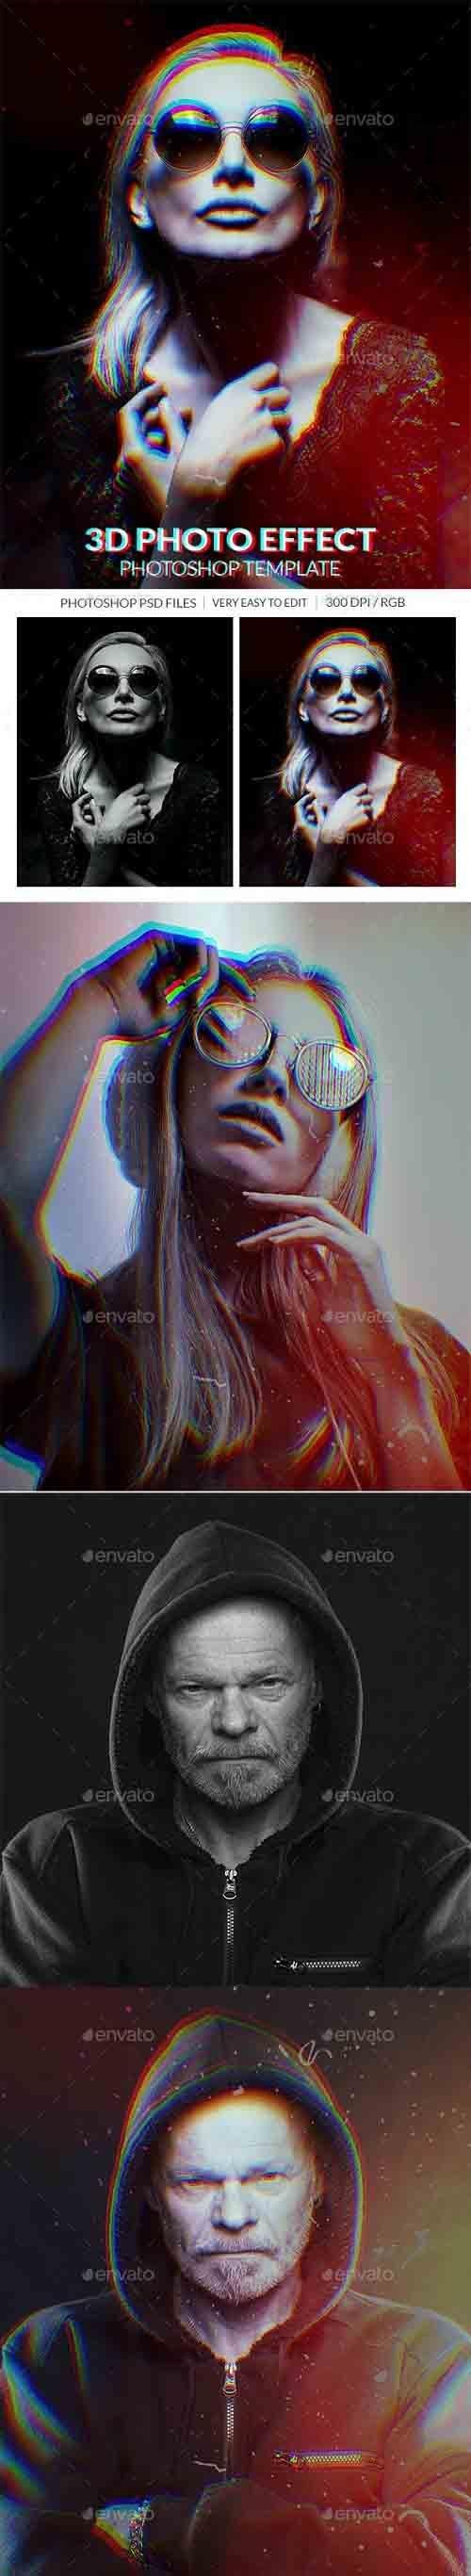 3d Photo Effect - 31131704